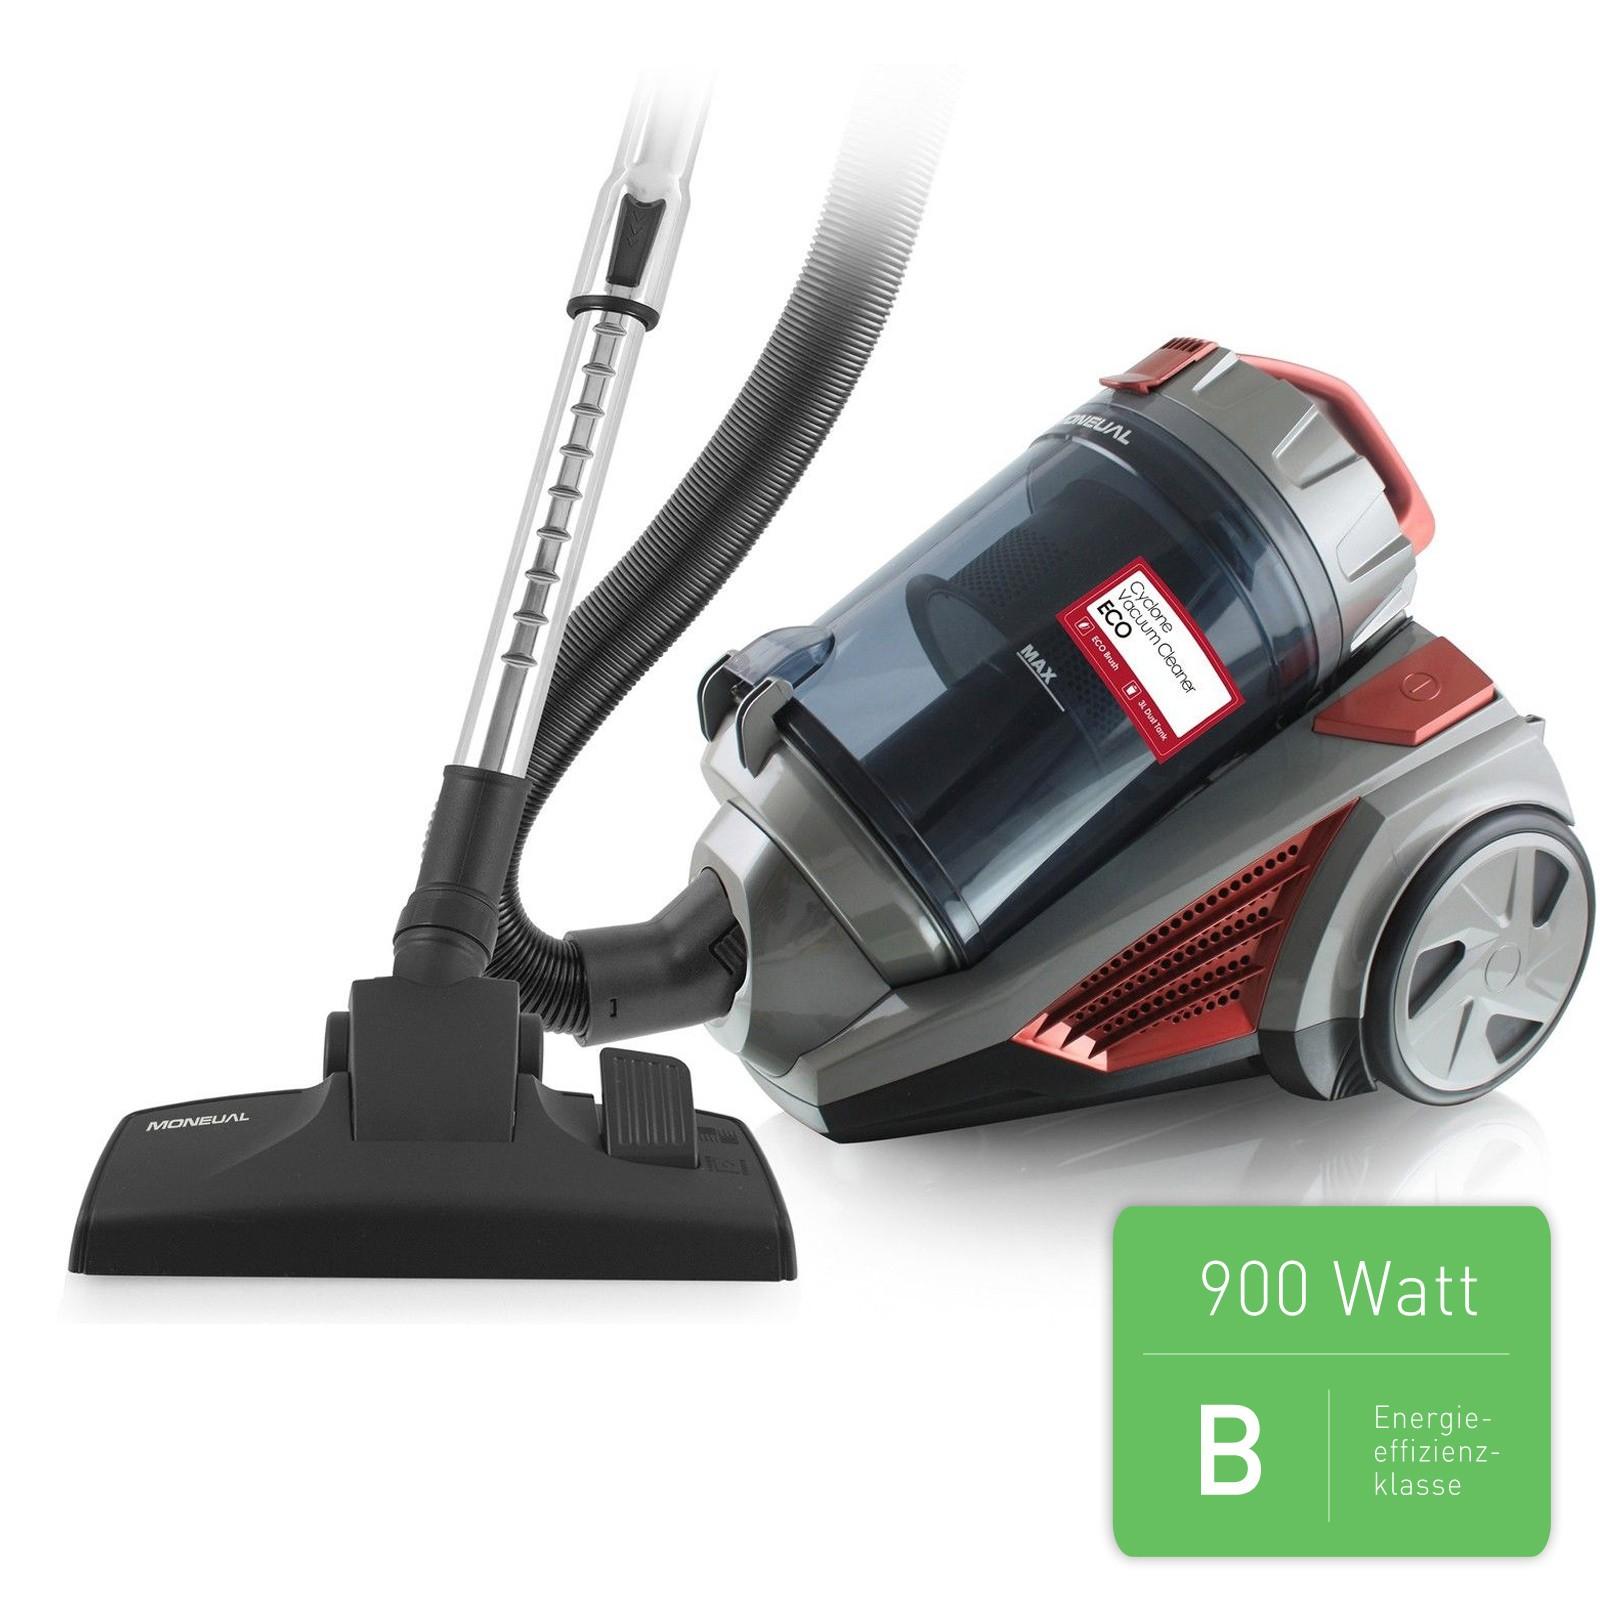 moneual mv300 cyclonepro beutellos staubsauger bodenstaubsauger 900 watt 3 liter ebay. Black Bedroom Furniture Sets. Home Design Ideas